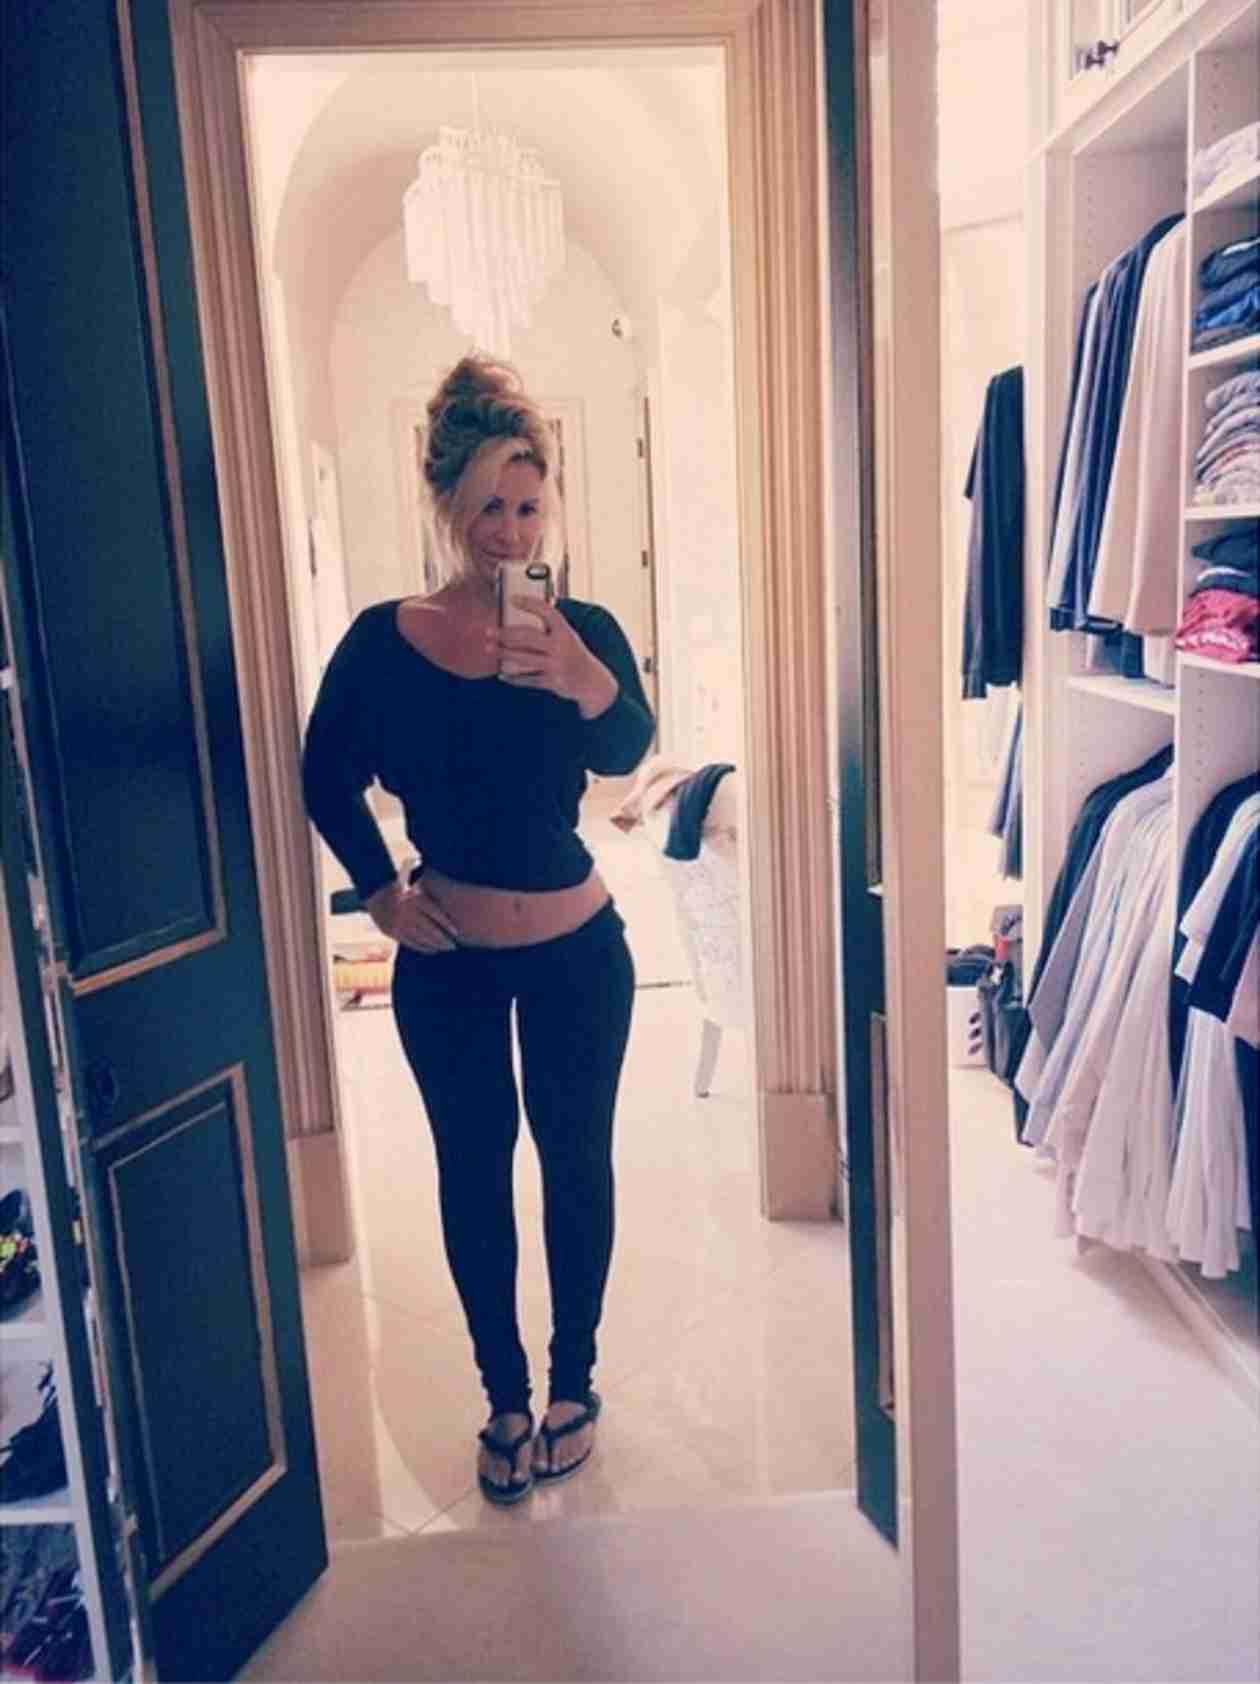 Kim Zolciak Shows Off Her Flat Stomach… in Sweats! (PHOTO)